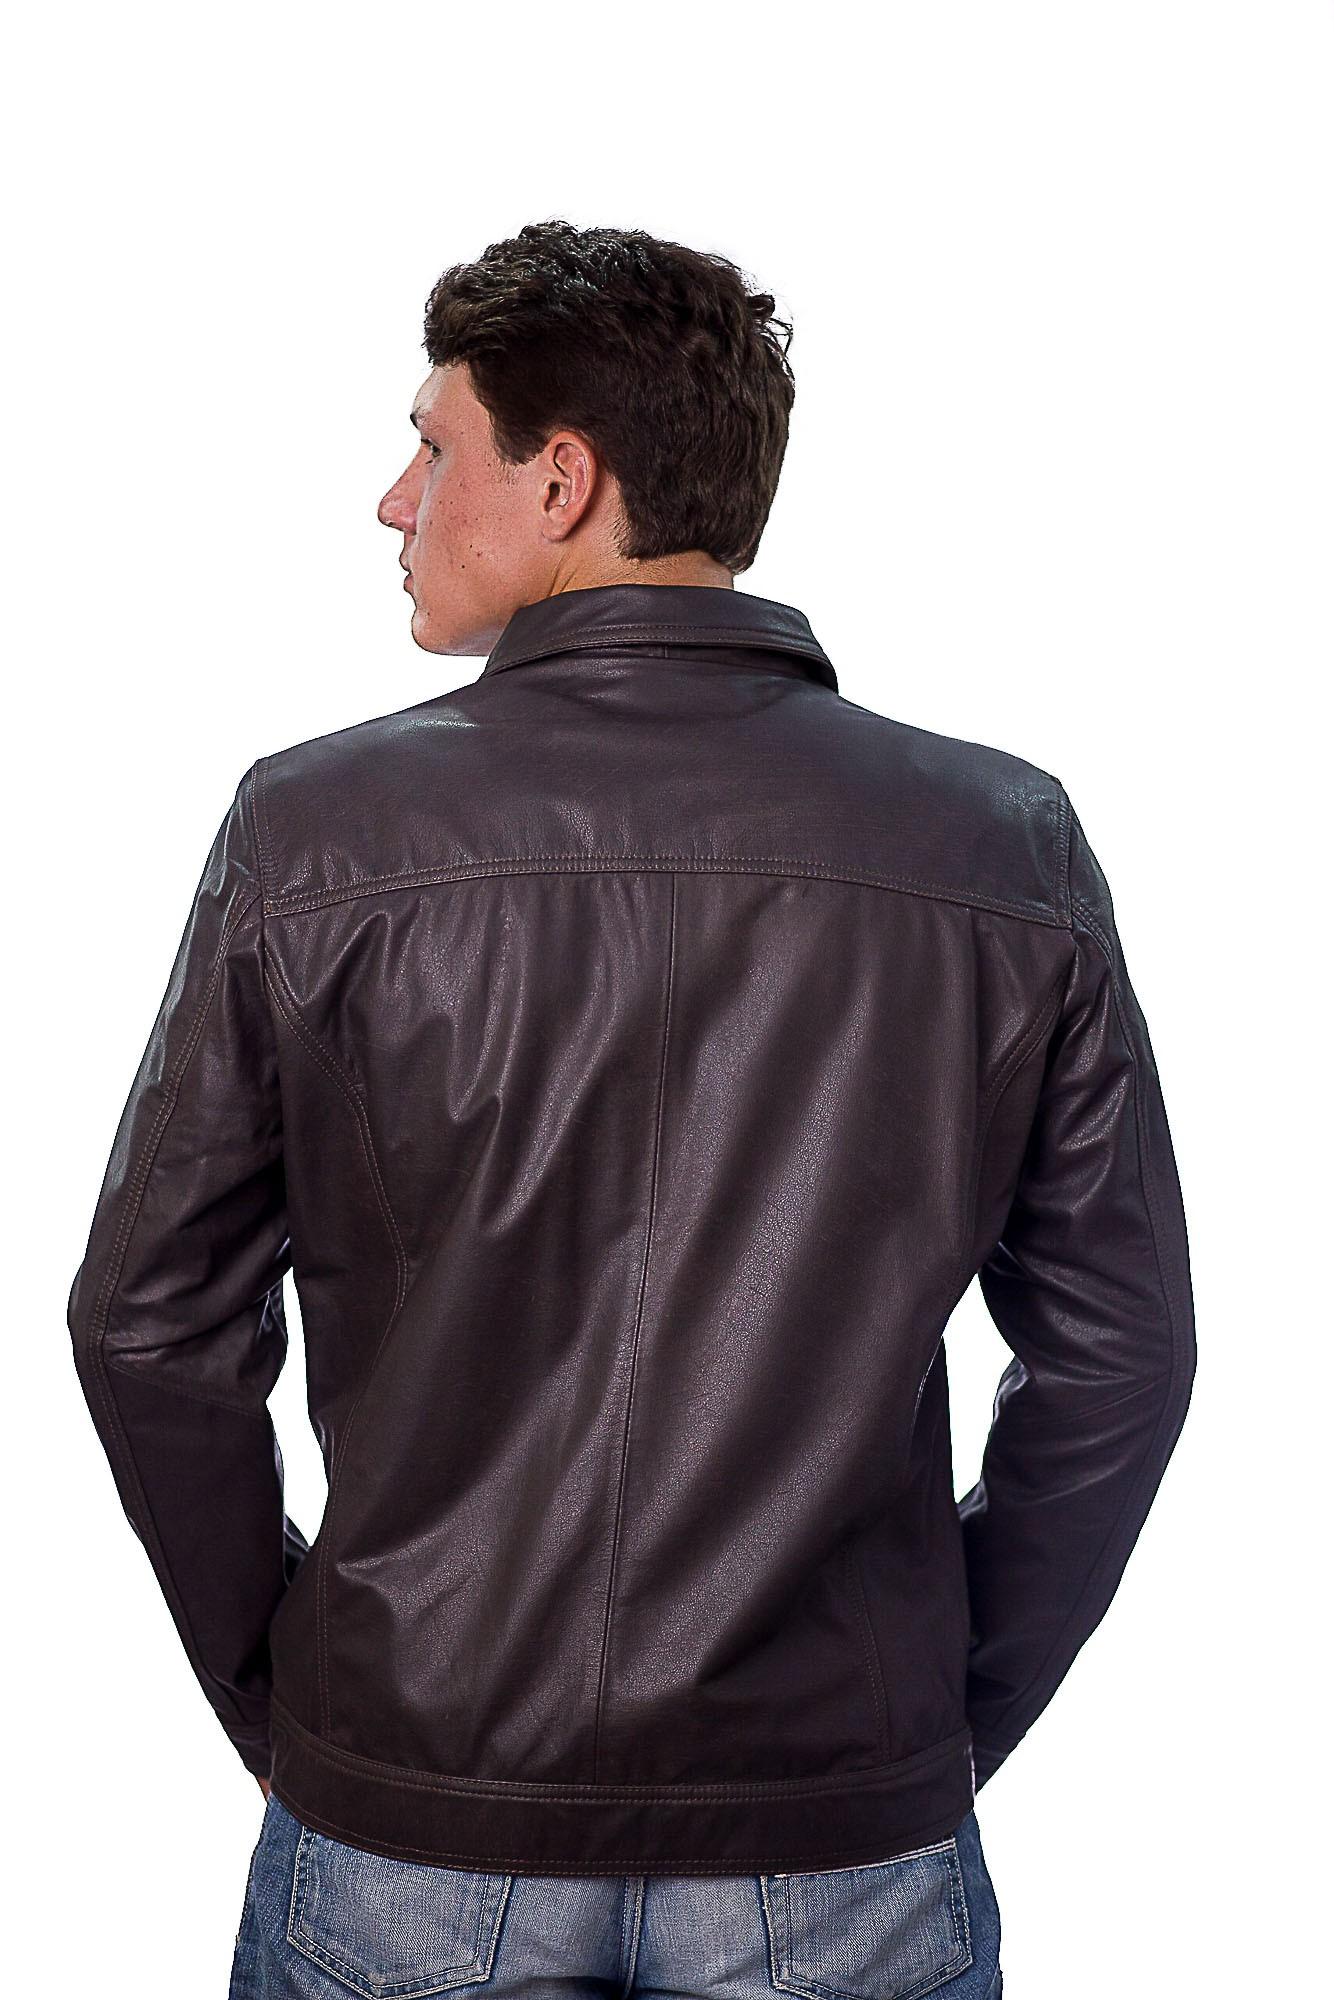 Jaqueta Masculina em Couro 765 Ranger Brown